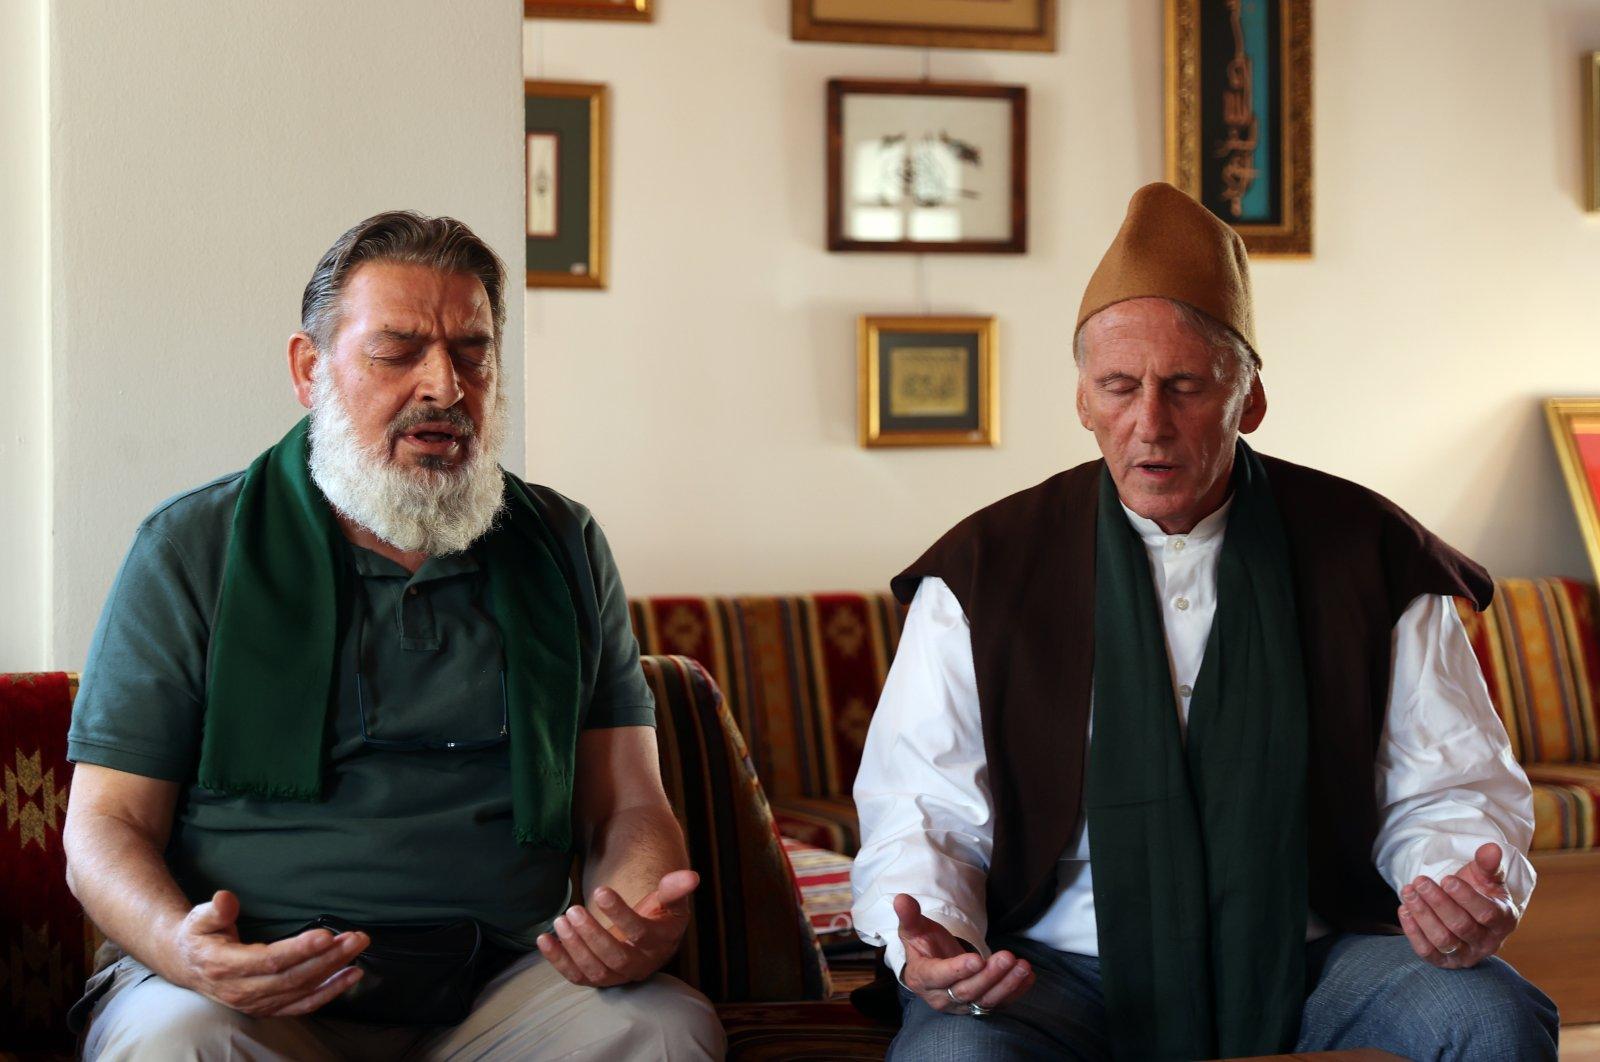 Ismail Fenter (R) prays along with Nadir Karnıbüyük in Konya, central Turkey, Sept. 23, 2021. (AA Photo)